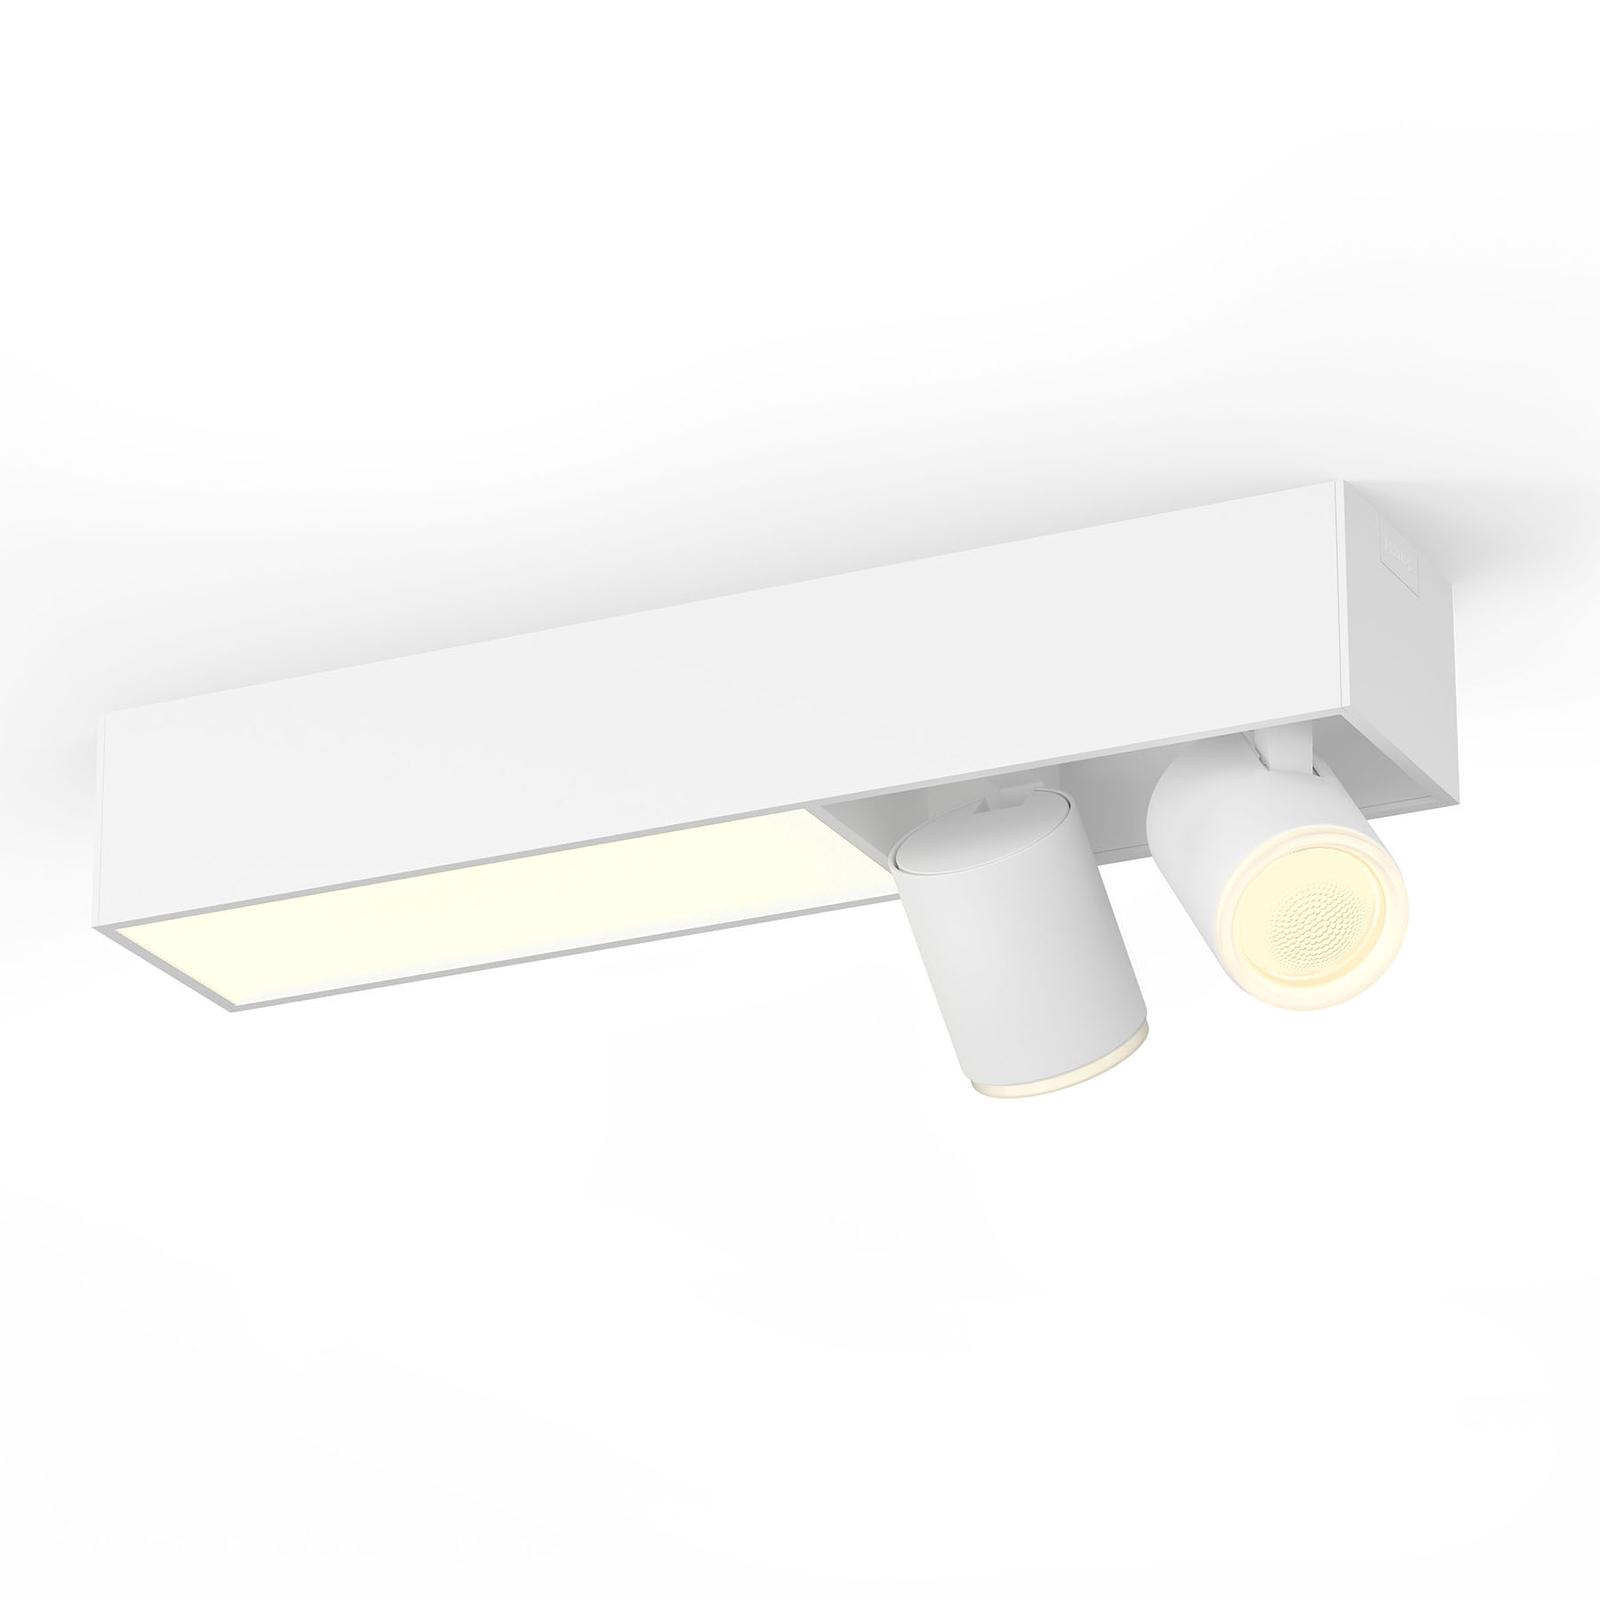 Philips Hue Centris LED-spot, 2 lyskilder, hvid